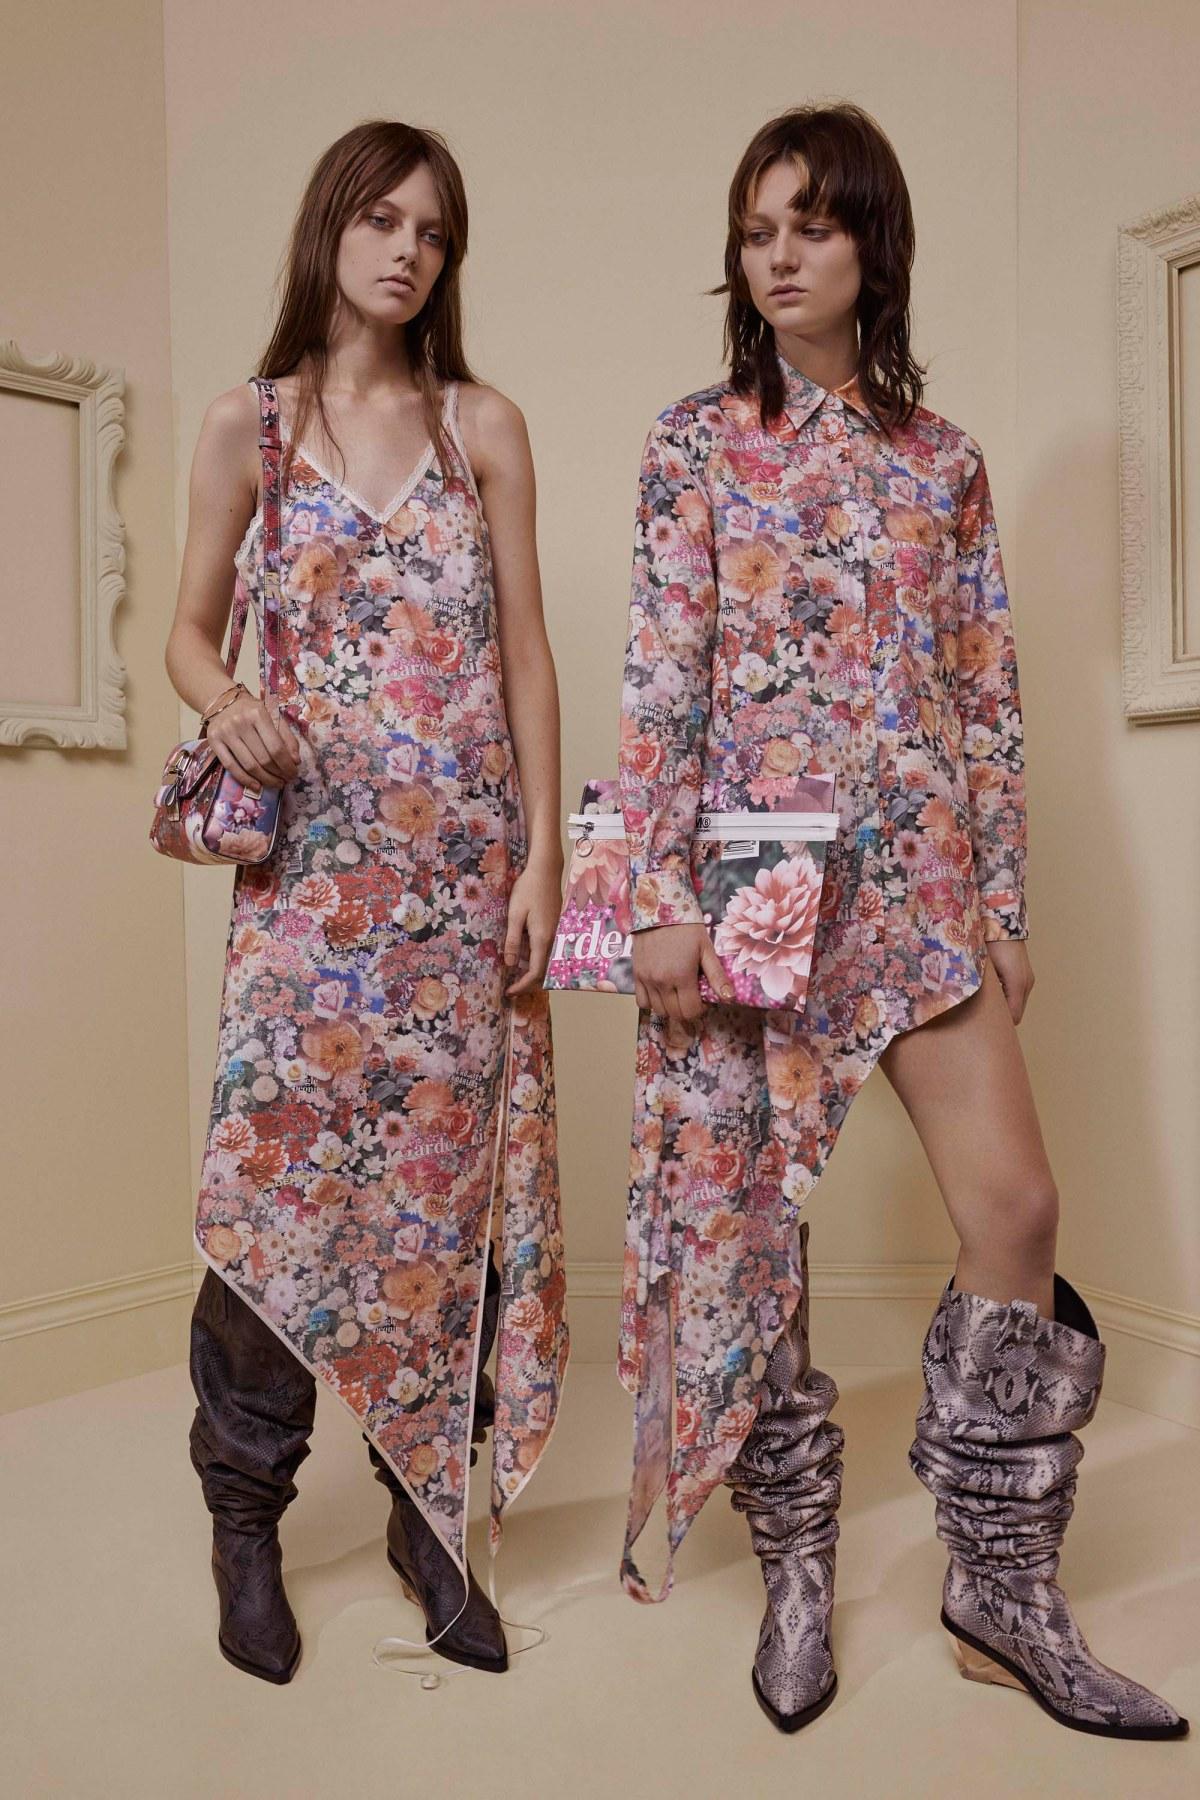 mm6-maison-margiela-pre-fall-2017-fashion-show-the-impression-06